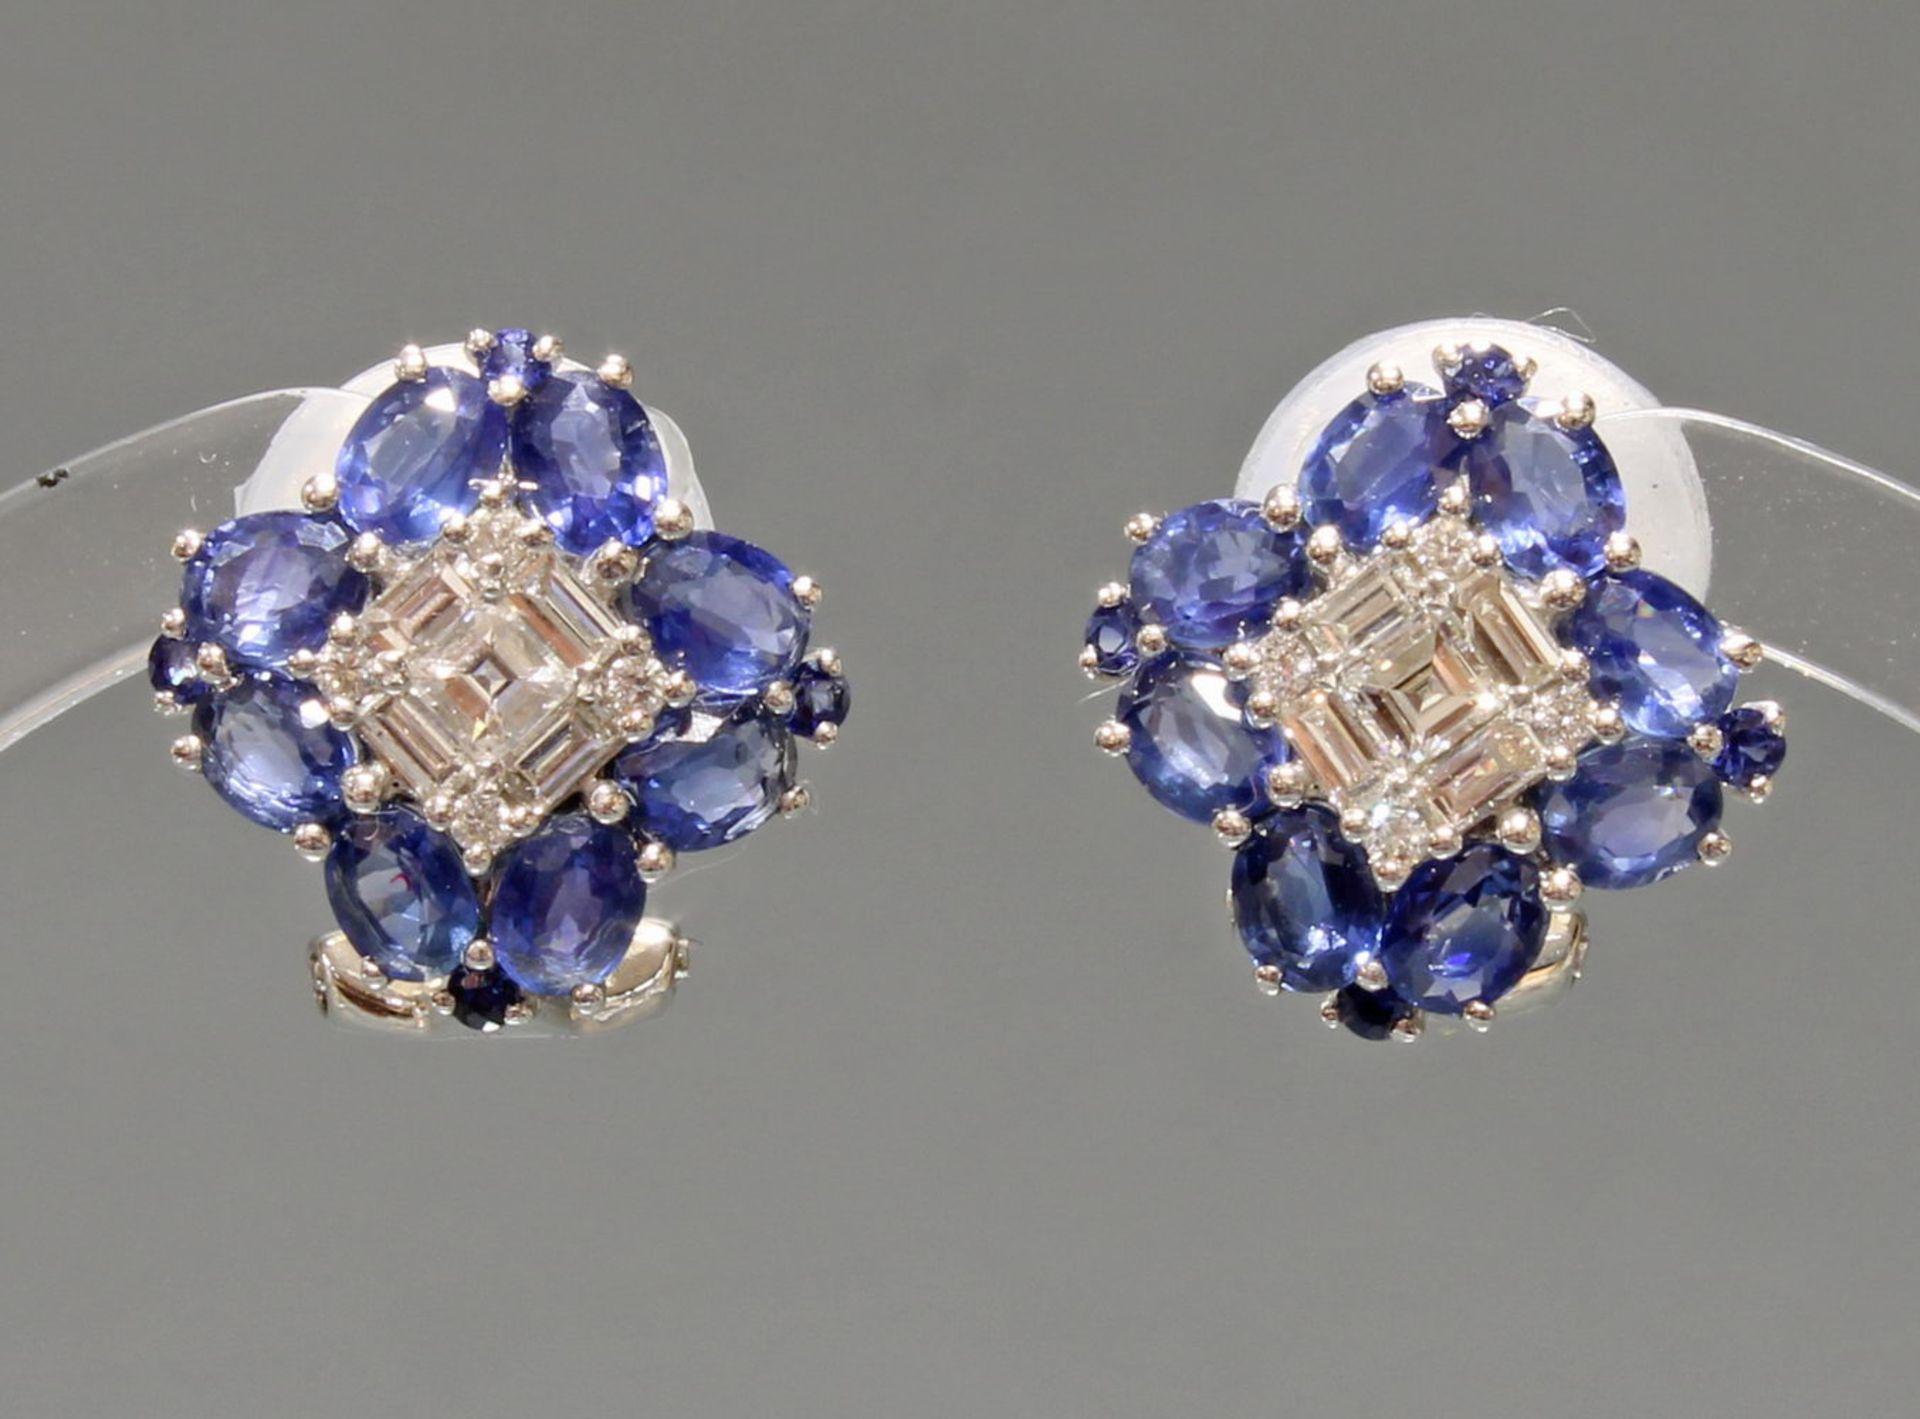 Paar Ohrstecker, mit Clip, WG 750, Brillanten, Diamanten zus. ca. 0.60 ct., etwa tcr/vs, Baguette-